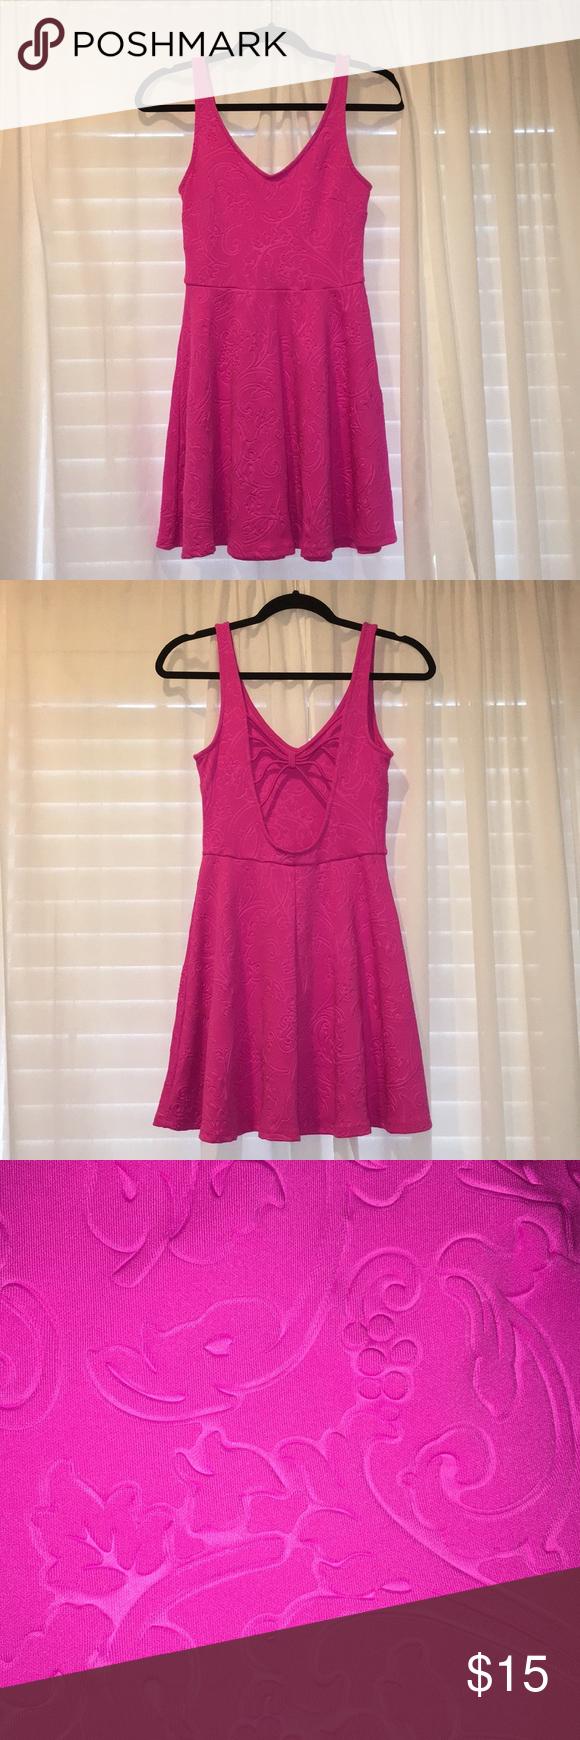 Pink dress forever 21  Forever Pink Dress  Bright pink dresses Pink dresses and Bright pink